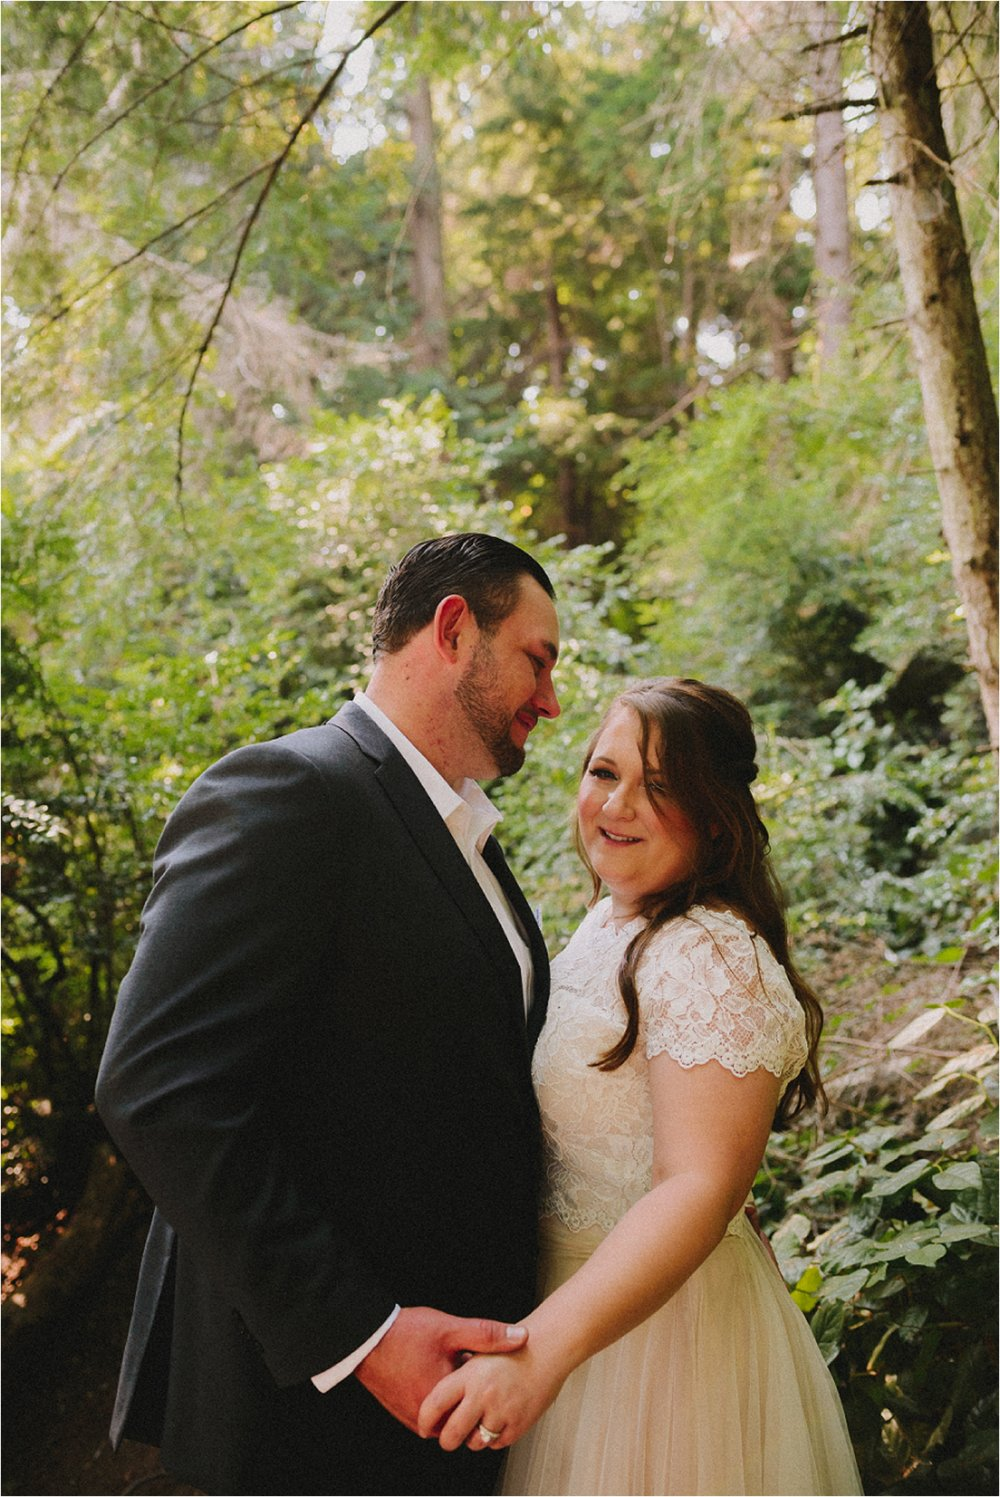 owen-beach-priest-point-park-tacoma-washington-elopement-jannicka-mayte-anchorage-alaska-wedding-elopement-photographer (31).jpg